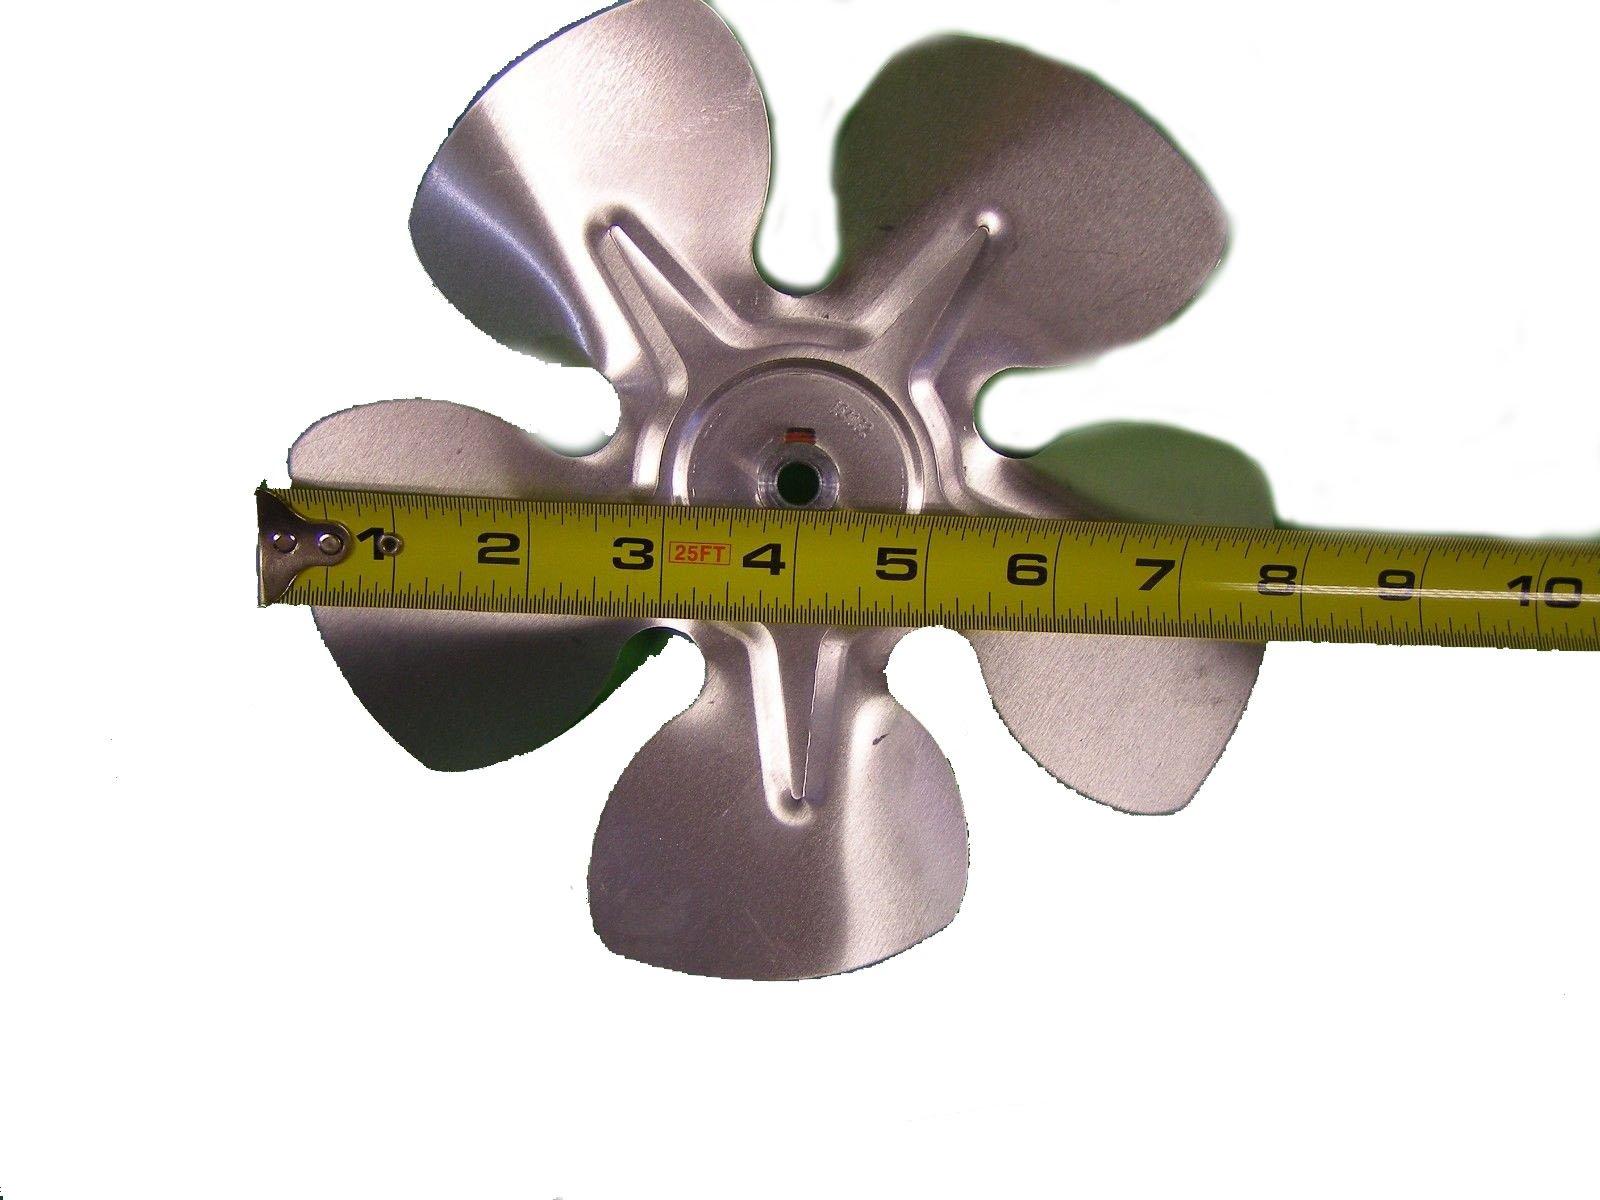 154032 Fan 8'' dia 5 Blade for Heaters Toro Champion Lawn Boy Gilson 97-100K BTU108994 223427 34280 602914